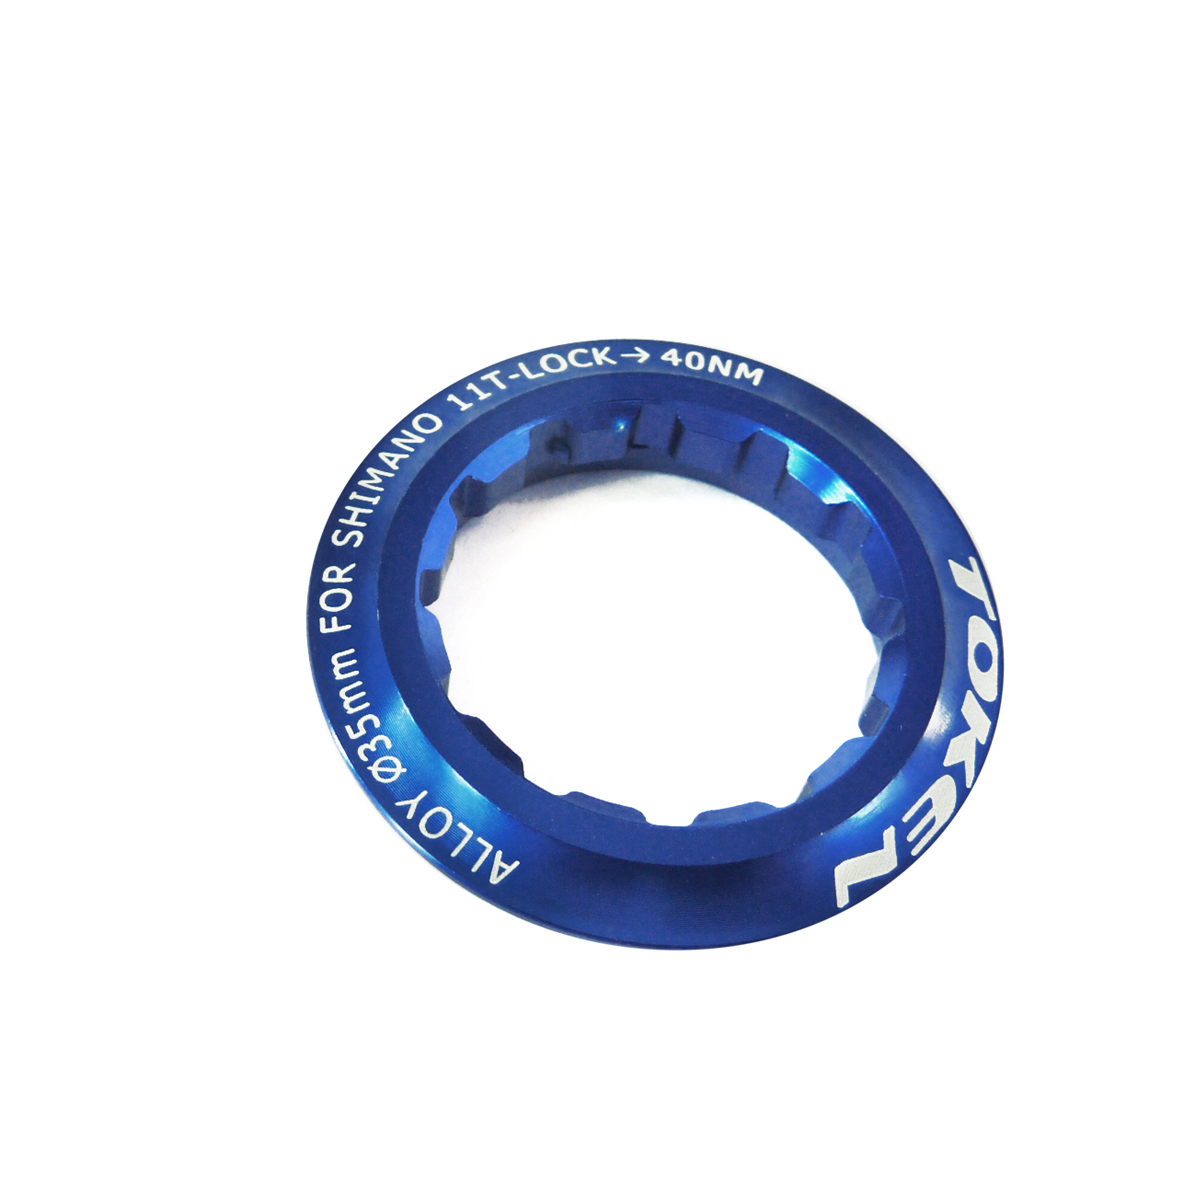 Écrou de cassette Token Shimano 11 dents Bleu